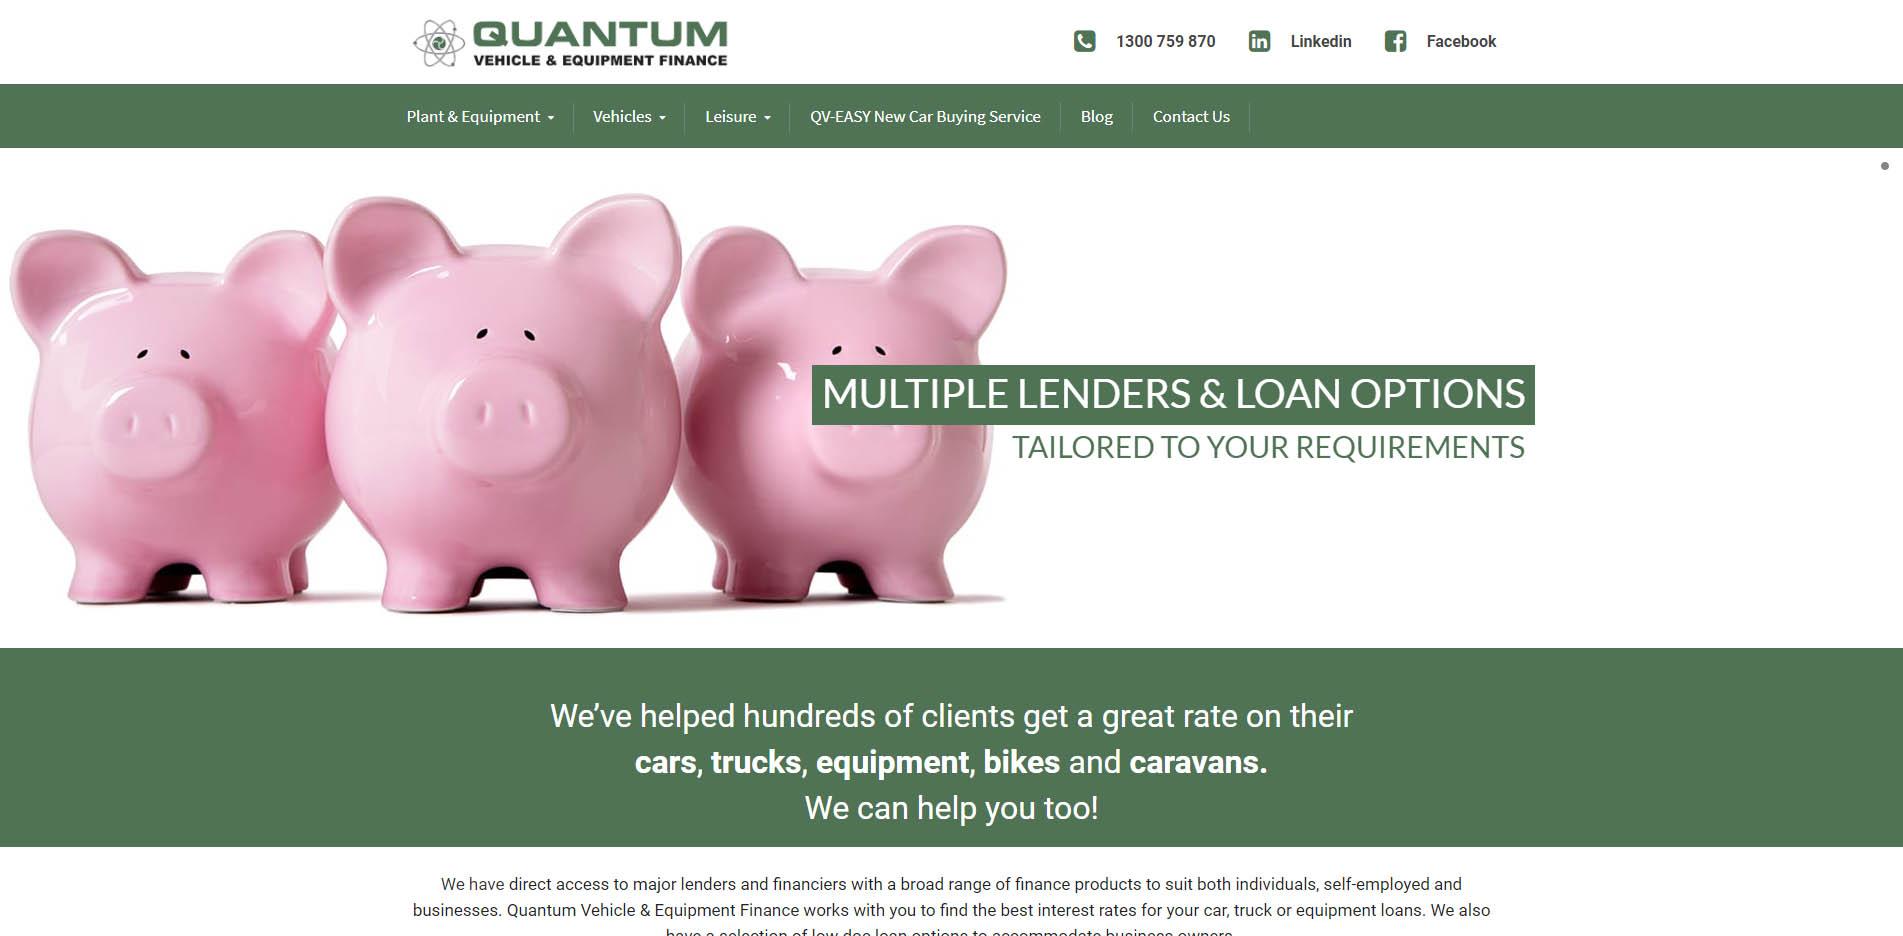 Quantum Financial Services